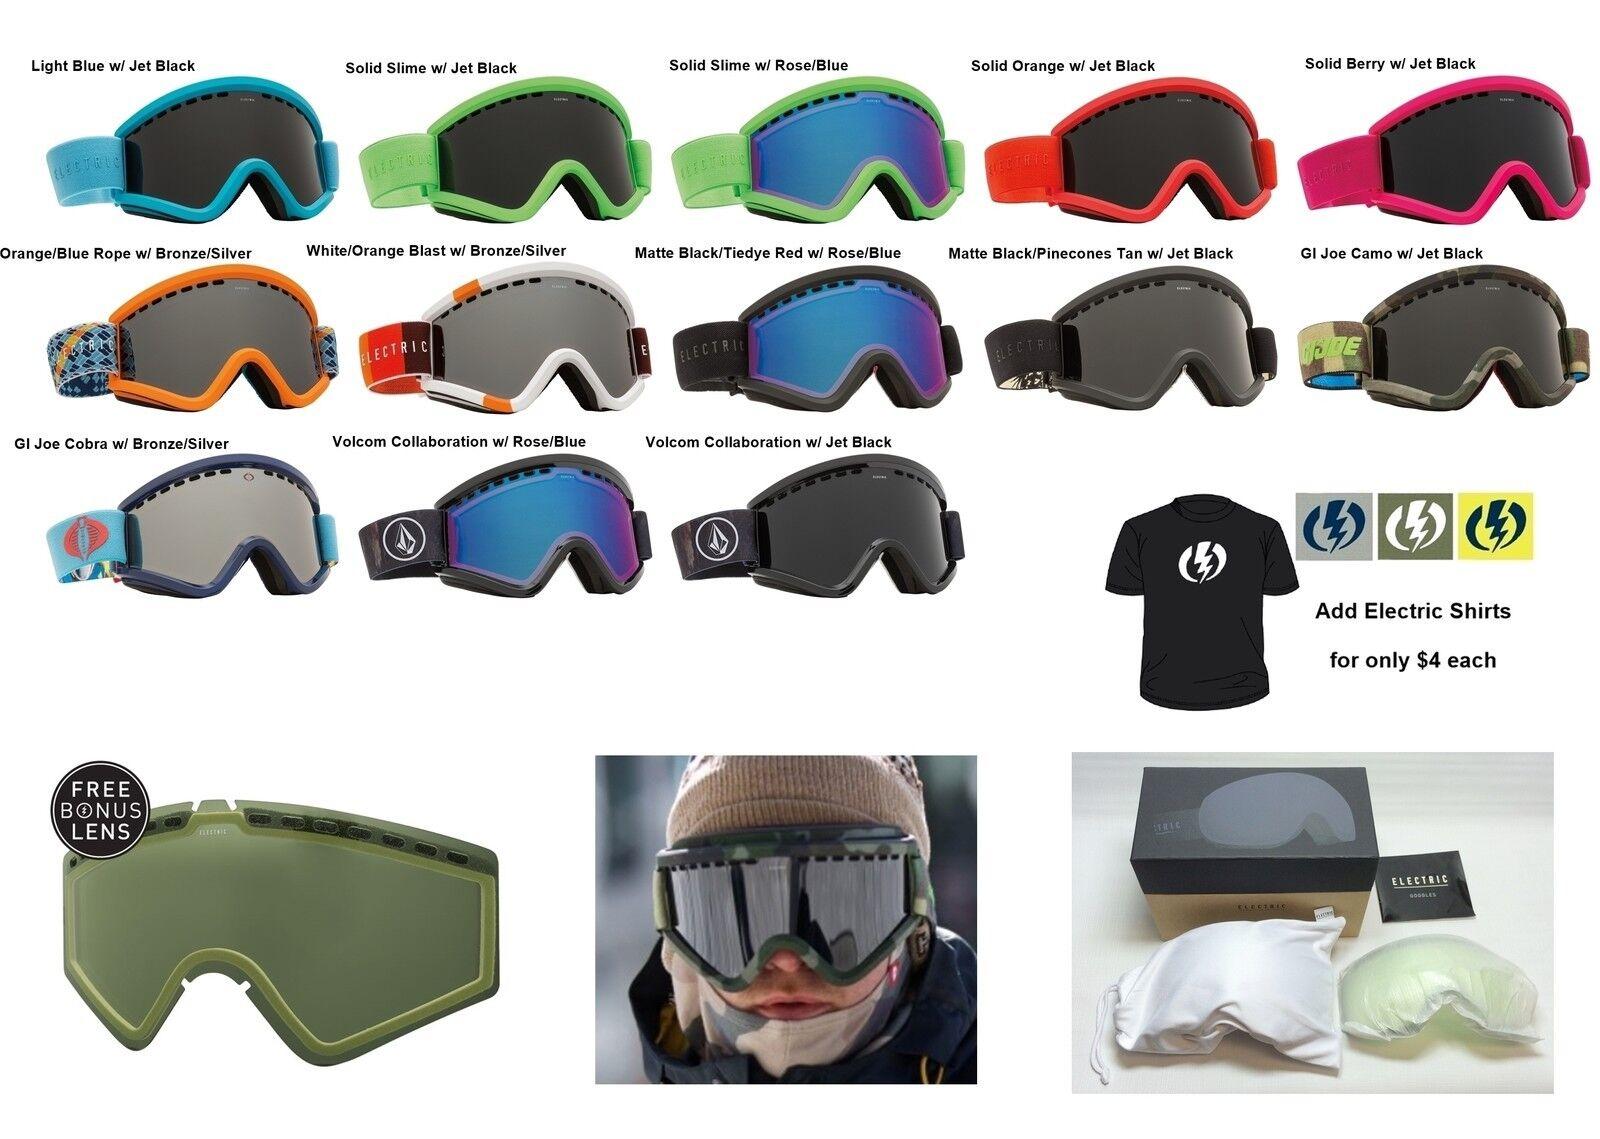 NEW Electric EGV mens womens ski snowboard goggles + lens 2016 Msrp